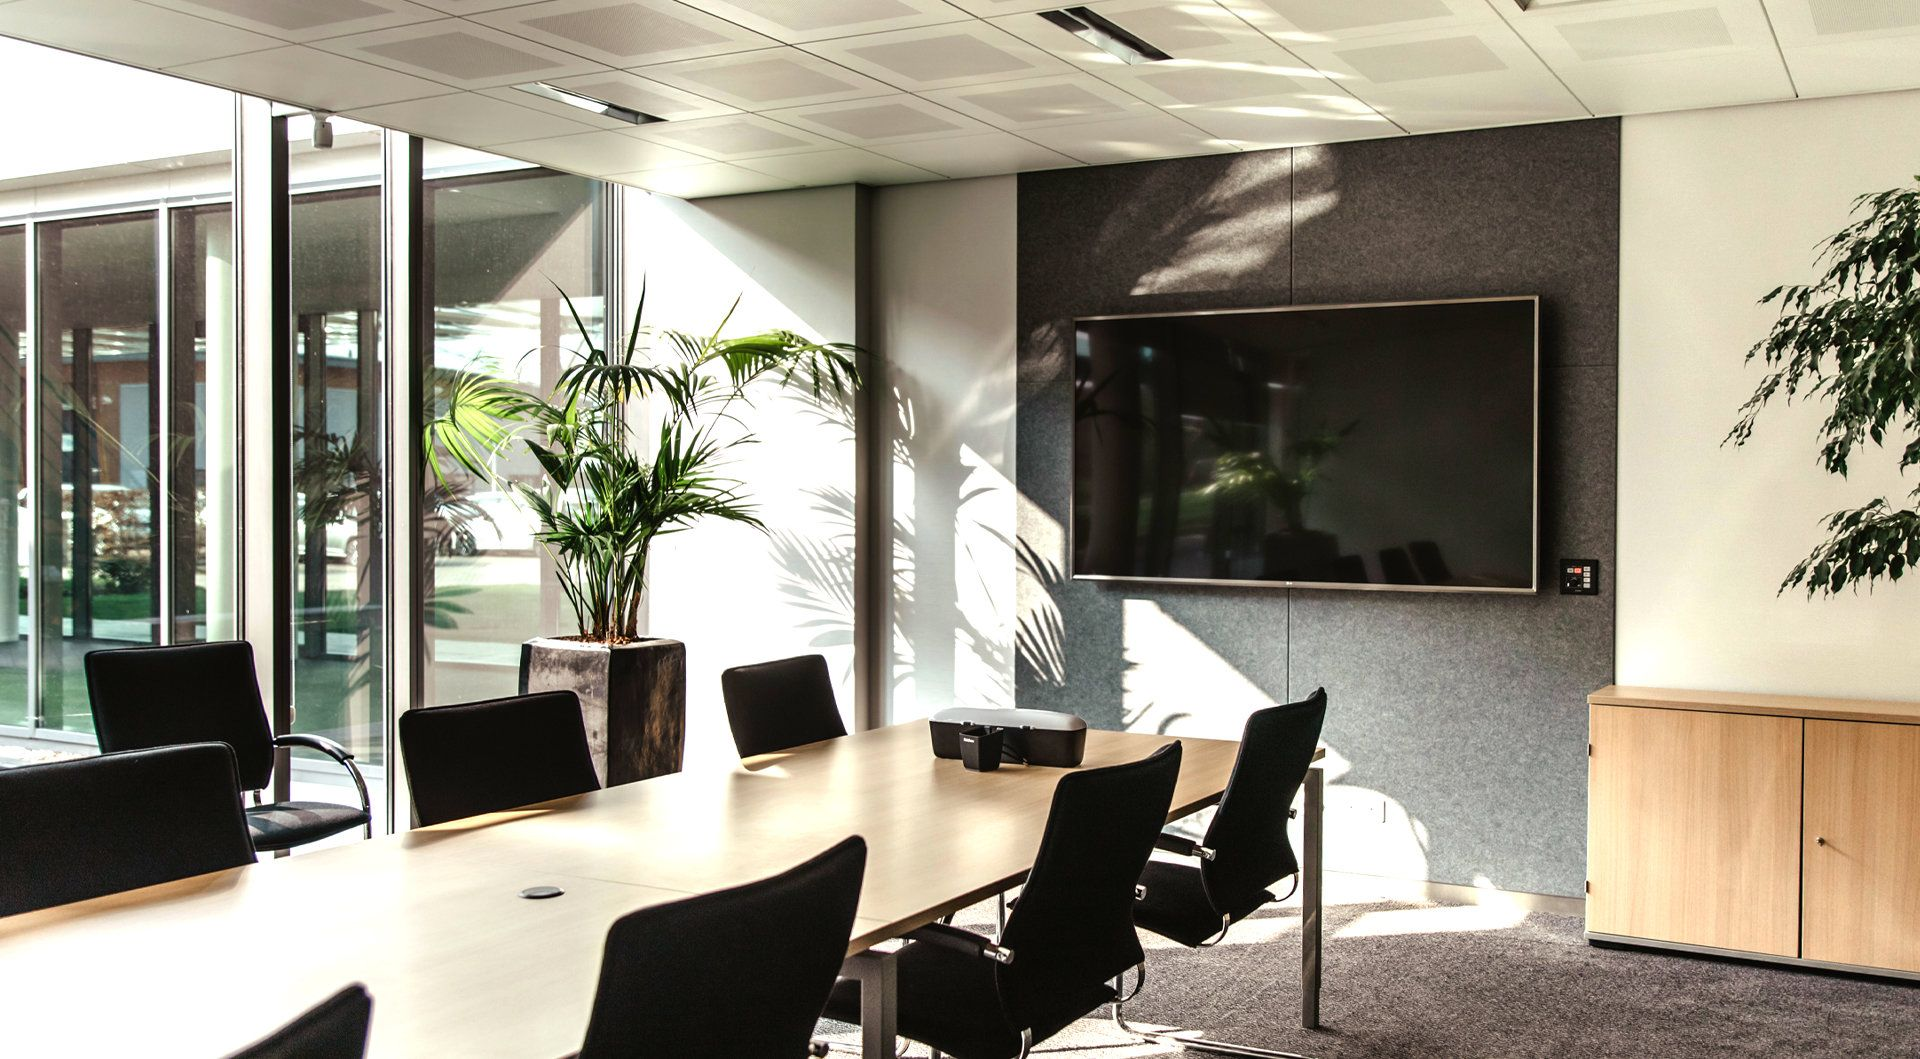 "LG 55XS2E beeldkrant 138,8 cm (54.6"") LED Full HD Digitale signage flatscreen Zwart - Case studie de vries"